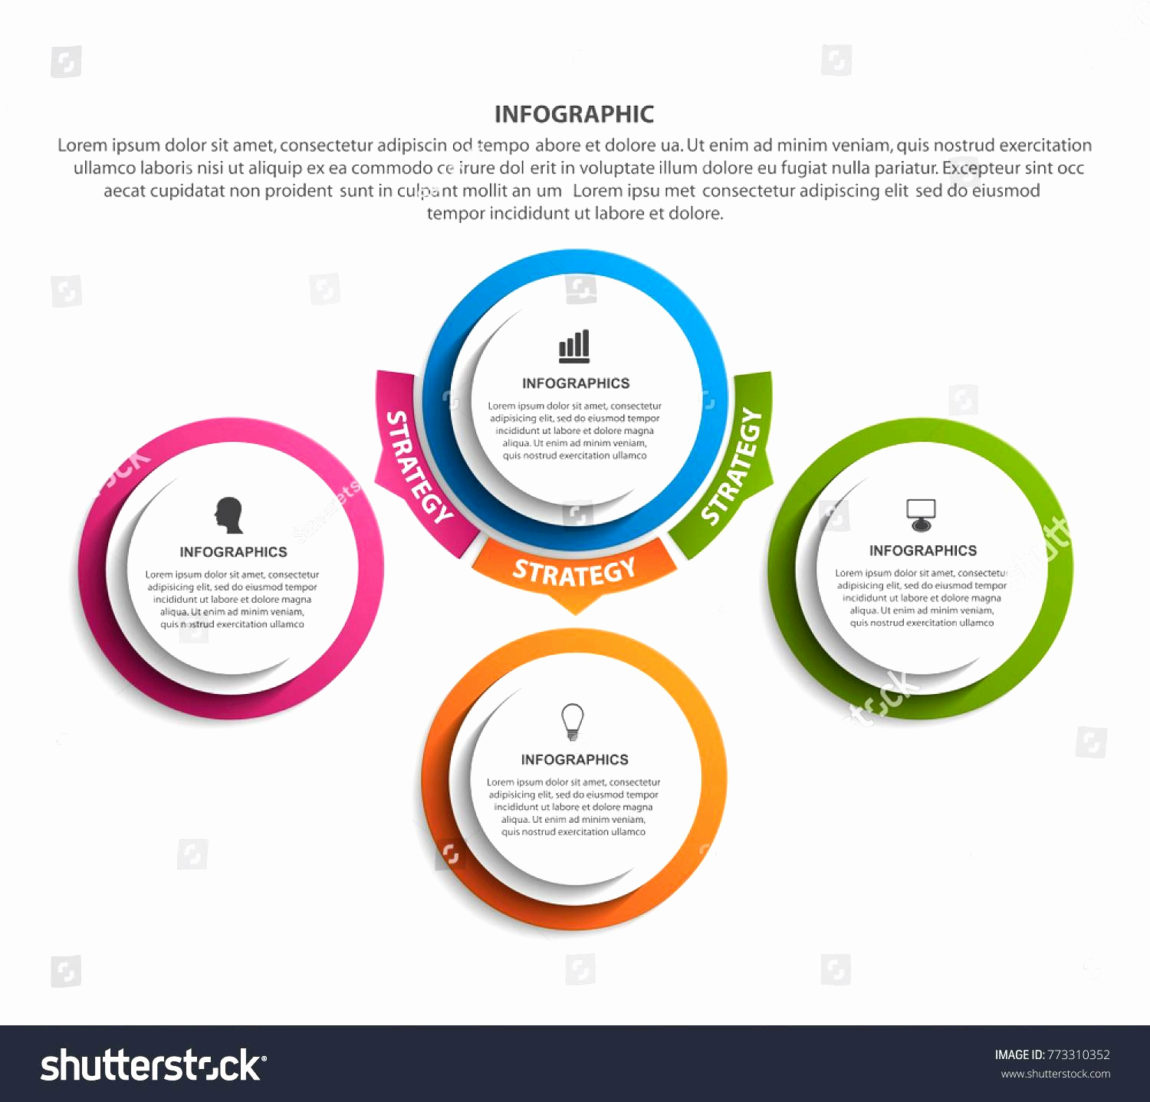 Social Media Marketing Project Design template Fresh social network Marketing Proposition Design template Fresh social network – FILES CONCEPTS – DOCUMENTS IDEAS